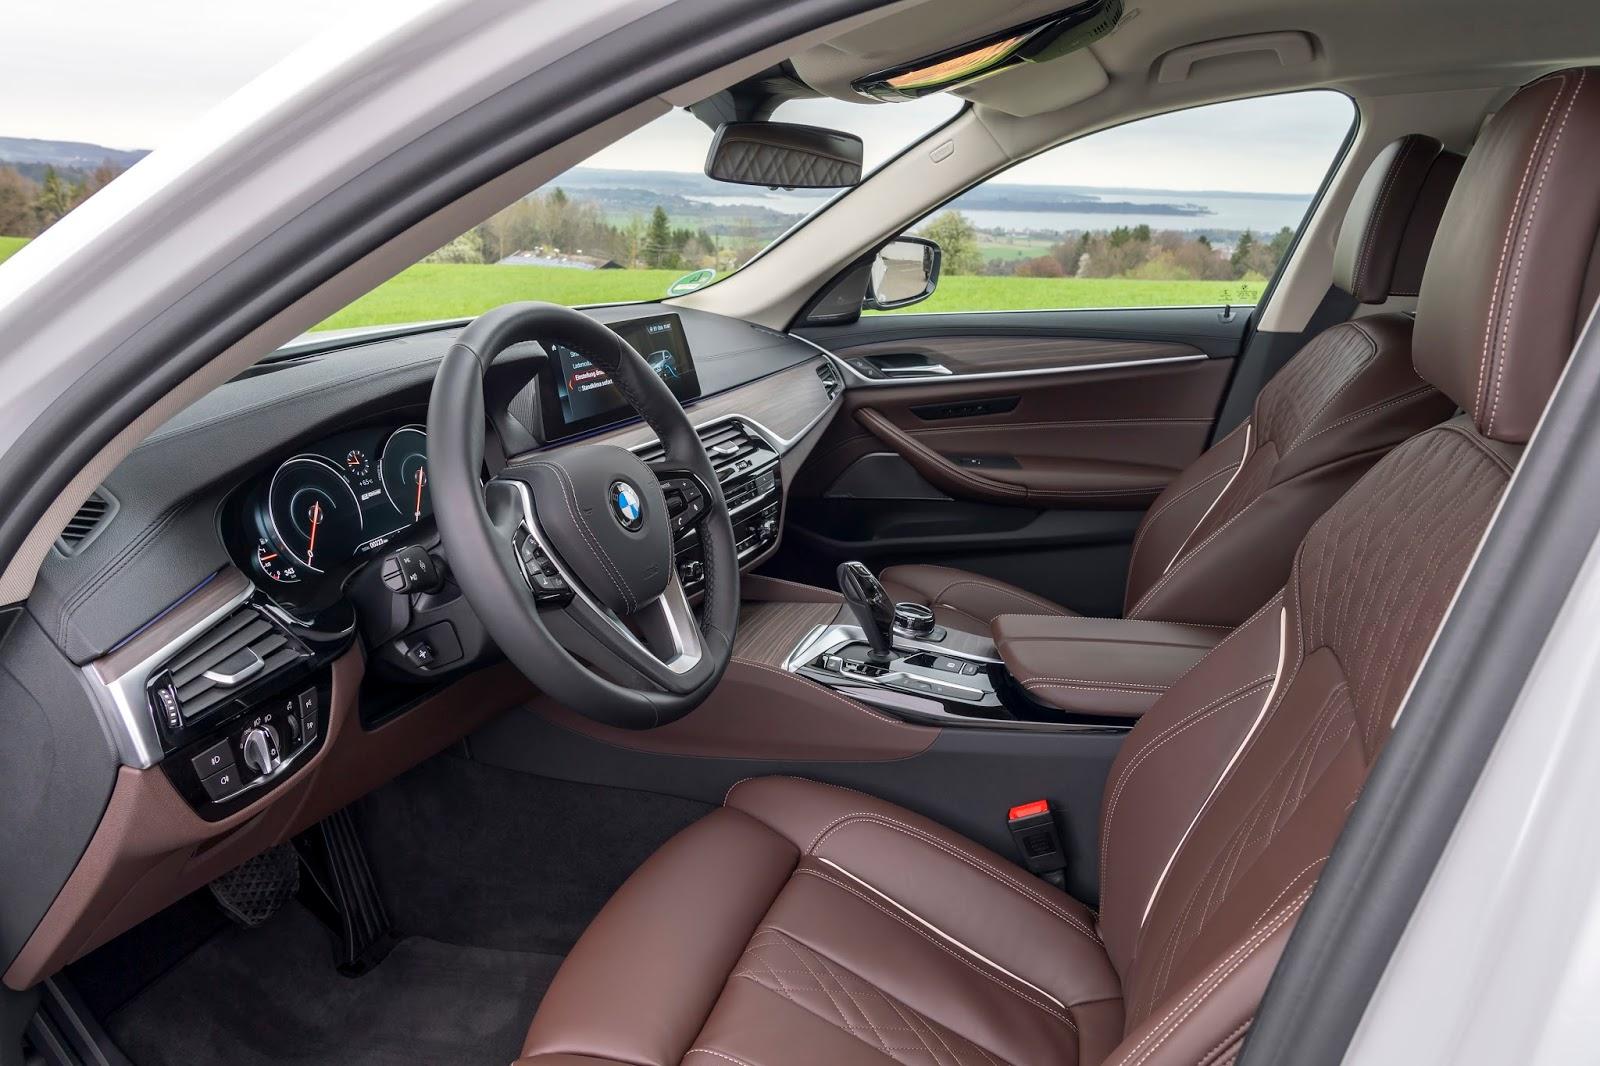 P90256383 highRes the new bmw 530e ipe Η BMW 530e iPerformance φέρνει την ηλεκτρική επανάσταση BMW, BMW 5, BMW 530e iPerformance, Electric cars, Hybrid, Λανσάρισμα